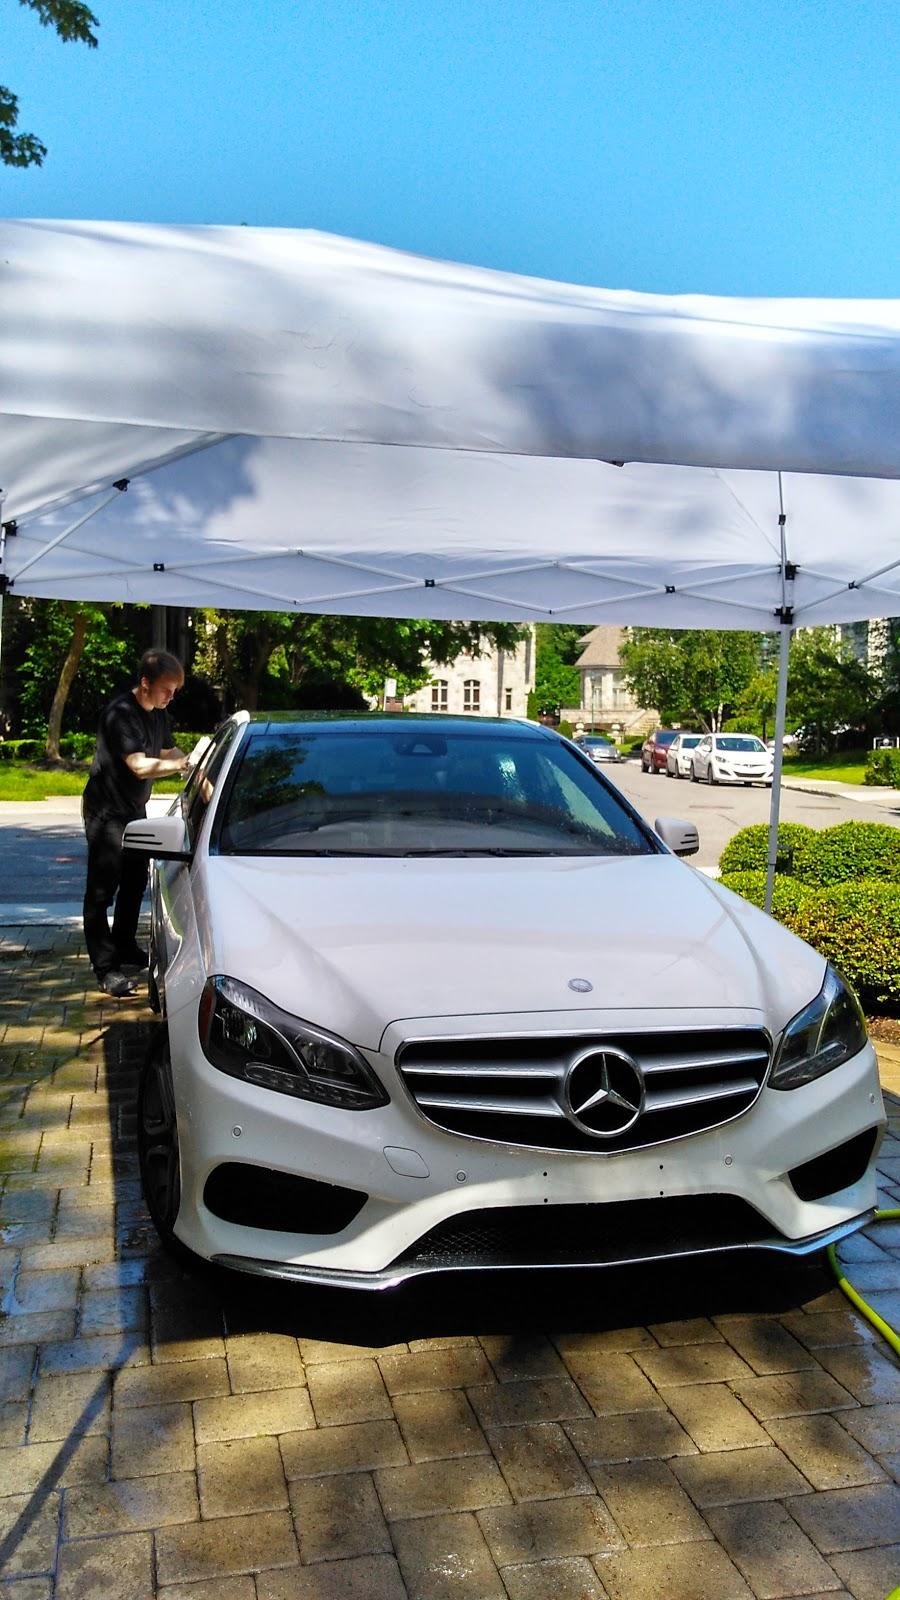 Wave   car wash   550 Chemin du Golf Suite 200, Verdun, QC H3E 1A8, Canada   8335149283 OR +1 833-514-9283